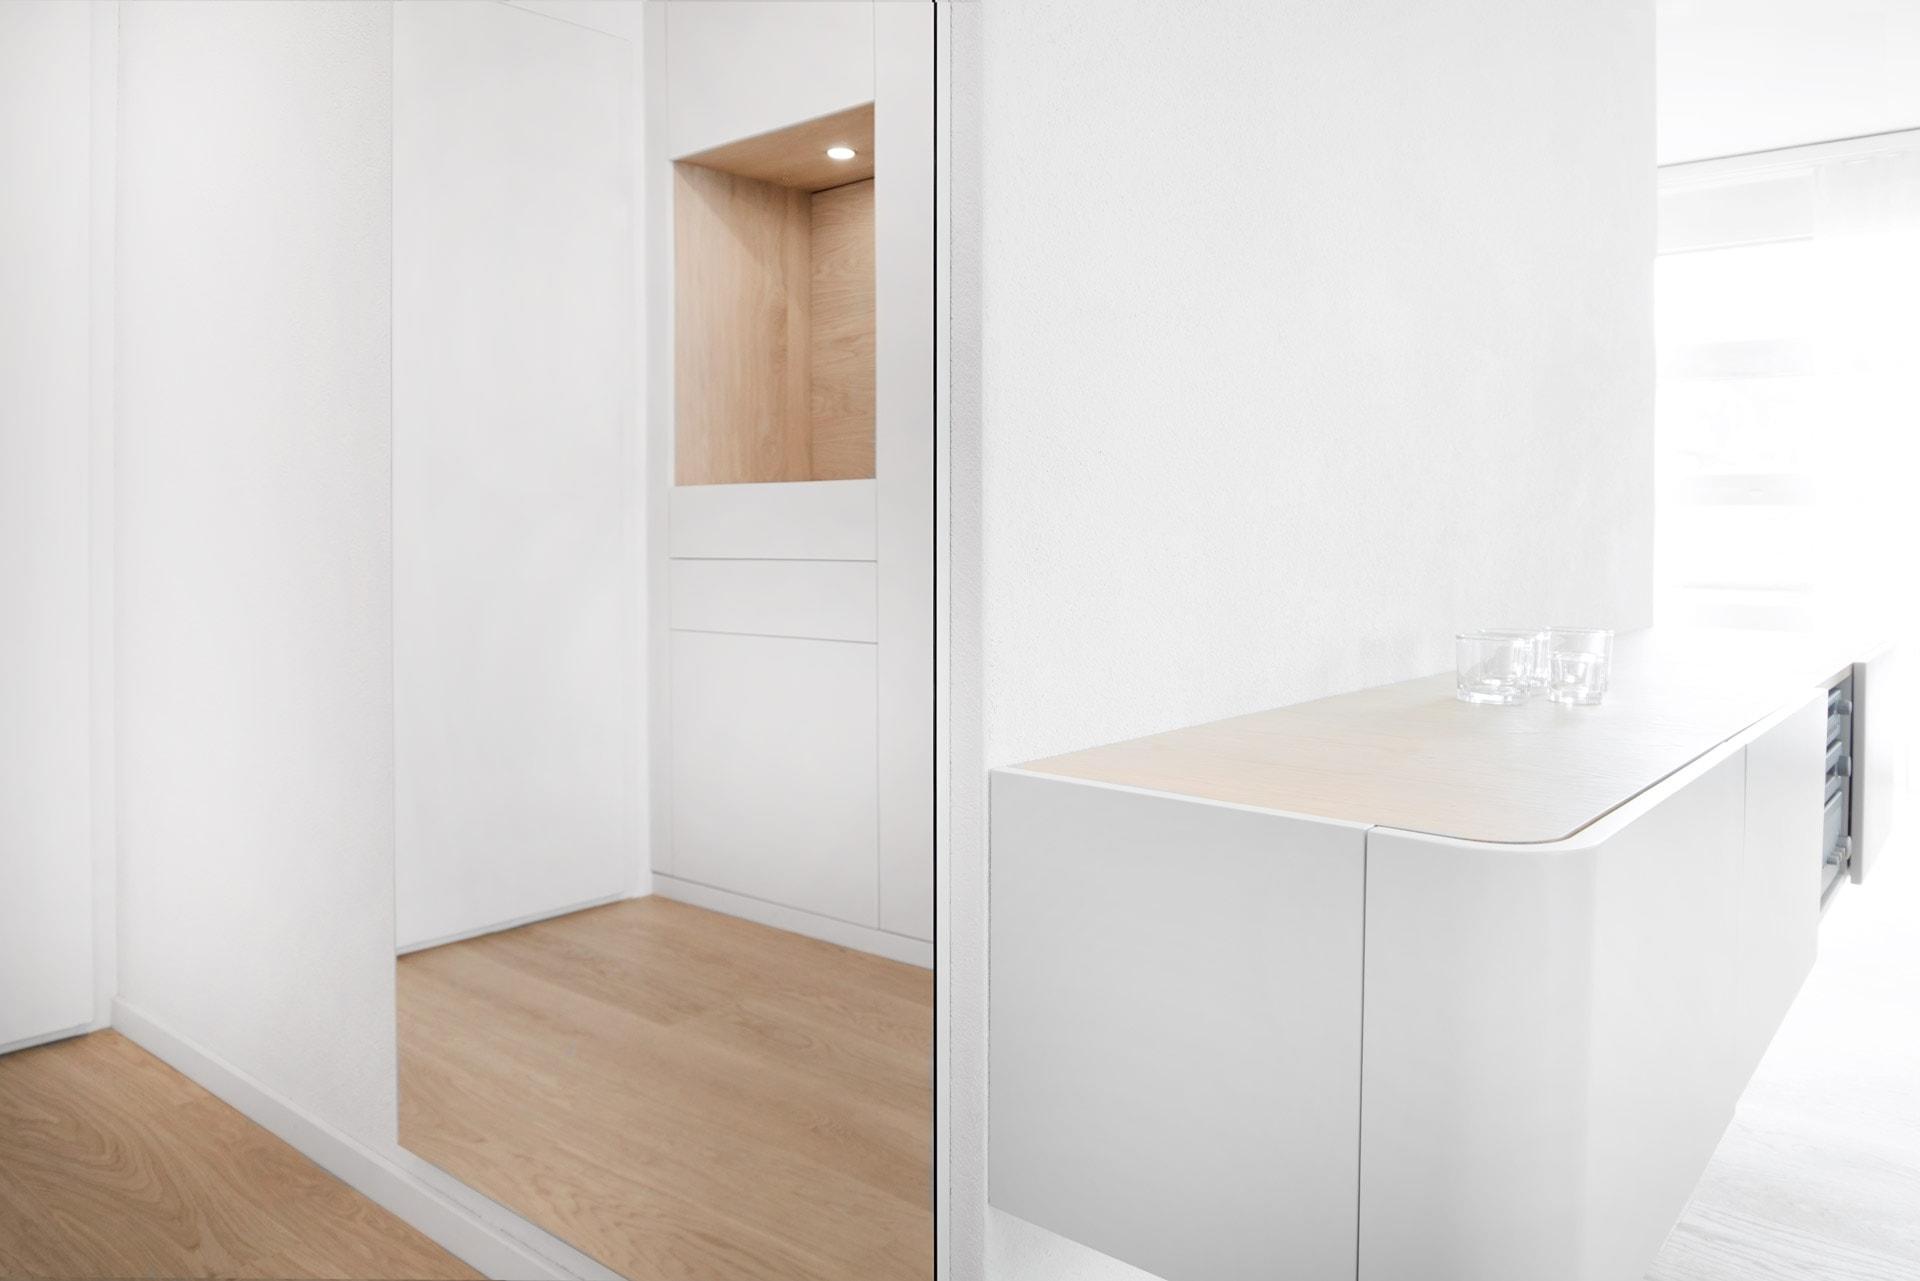 venuti-architects-sideboard-2